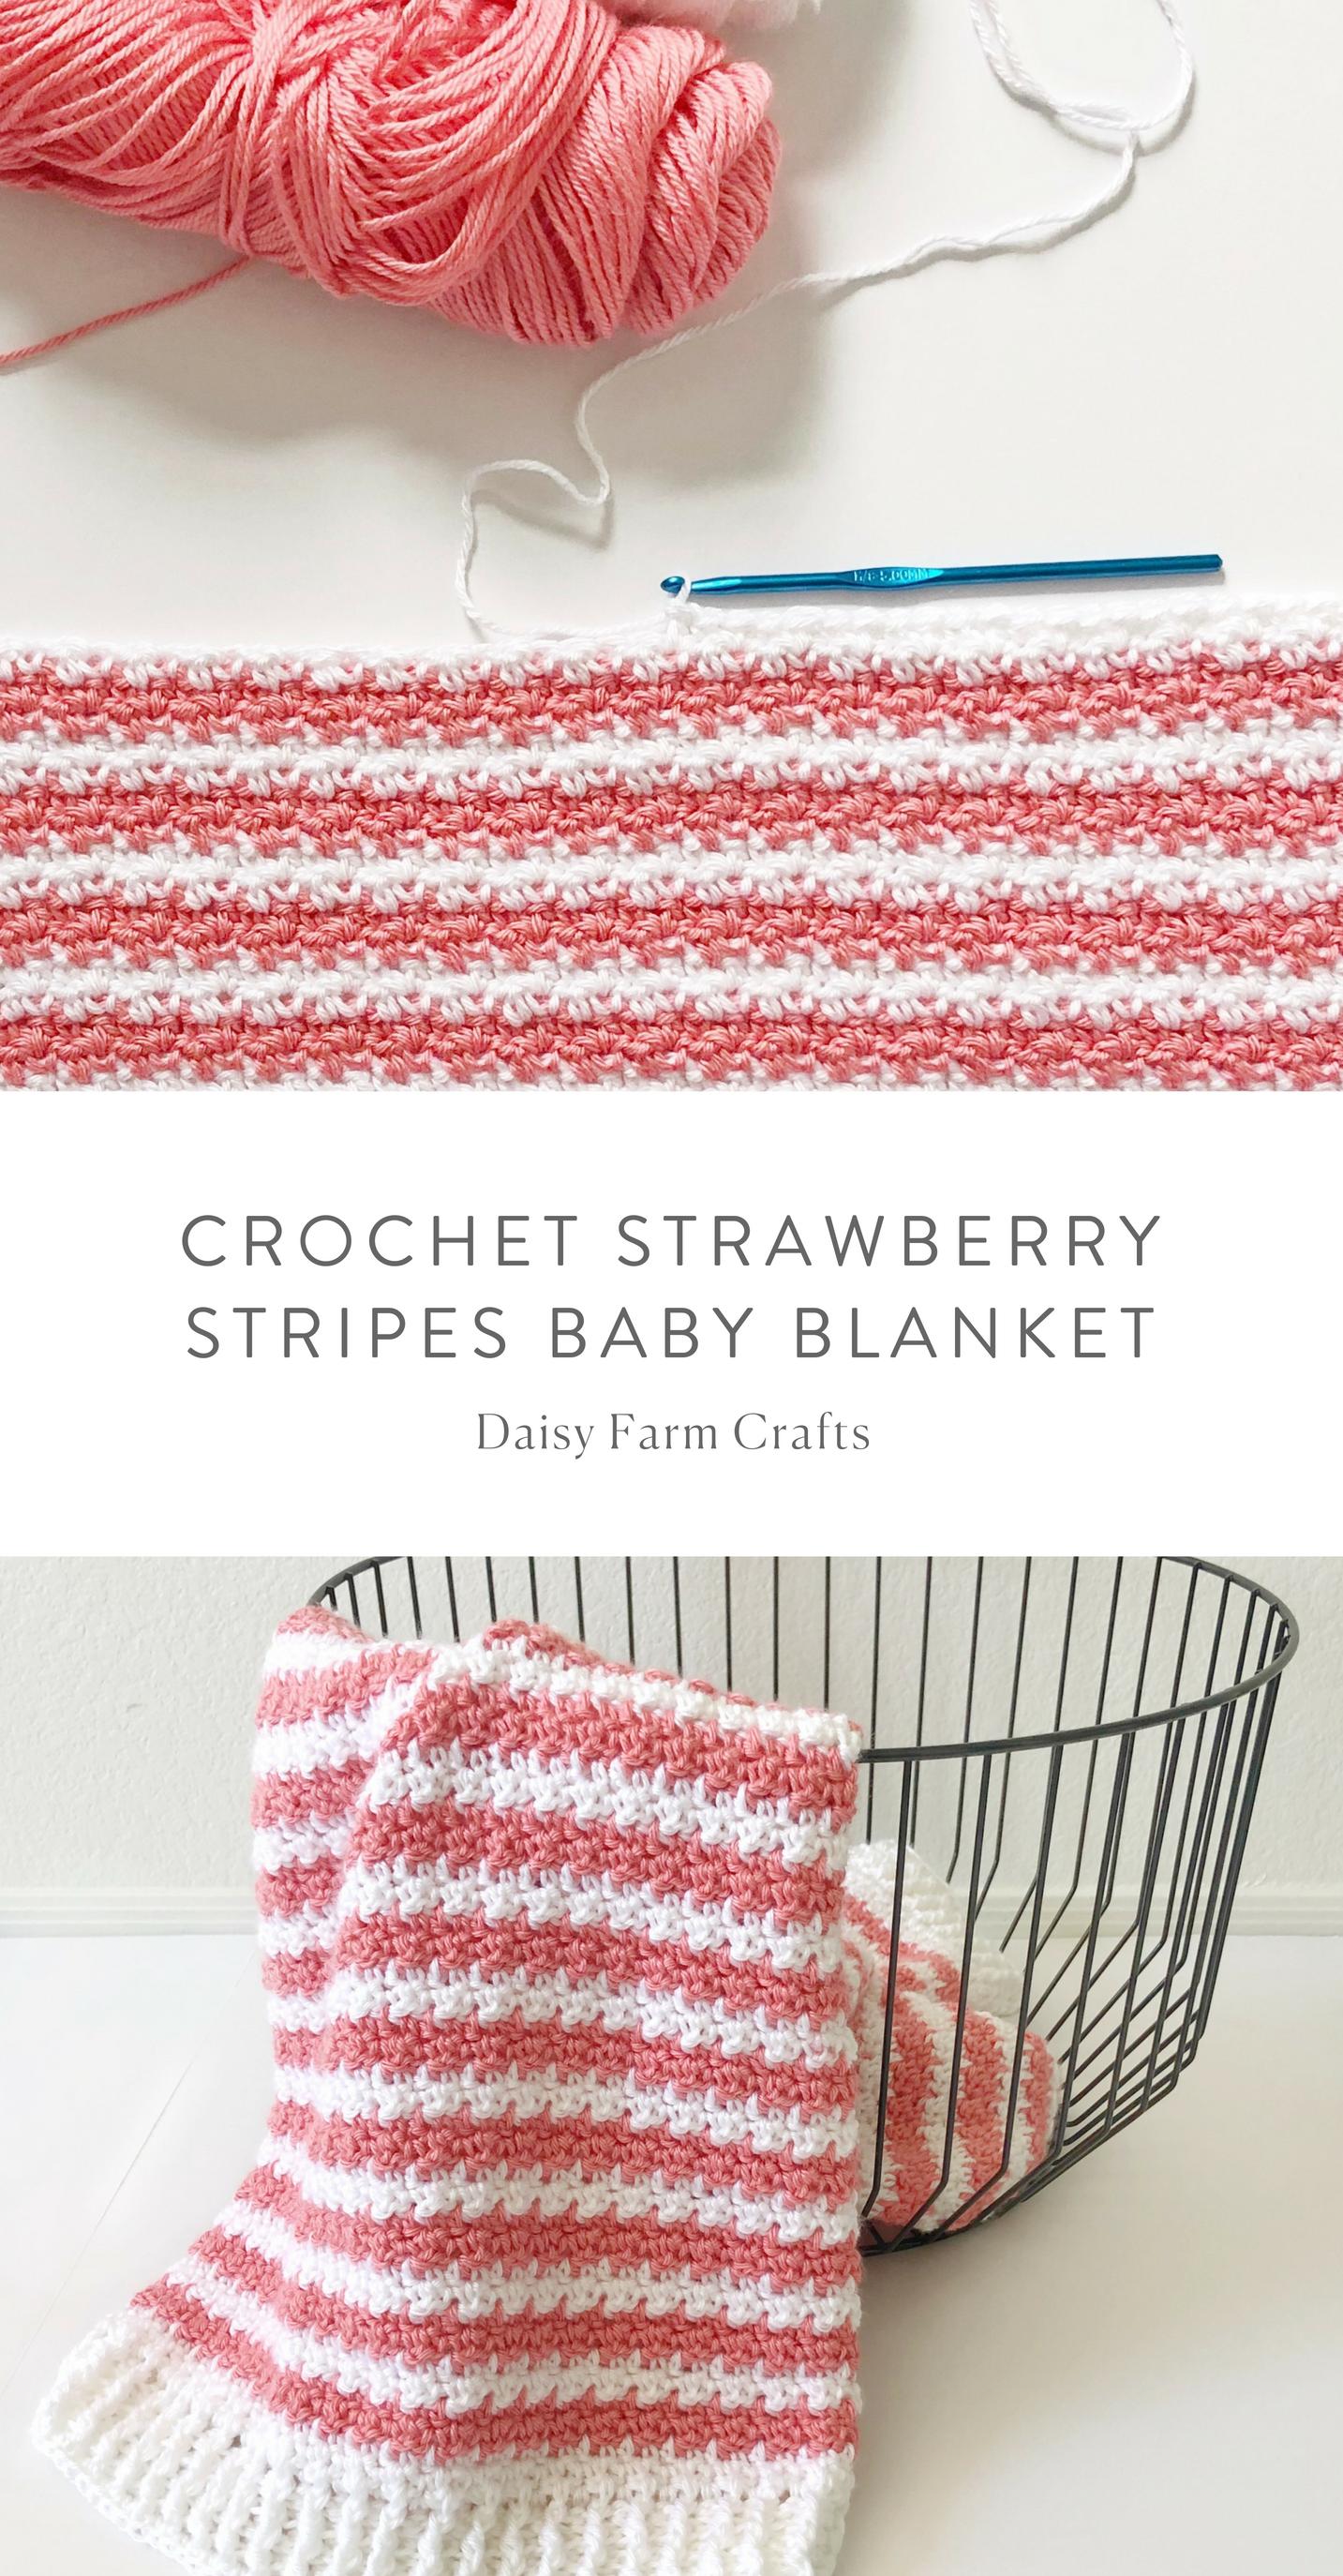 Free Pattern - Crochet Strawberry Stripes Baby Blanket #crochet ...